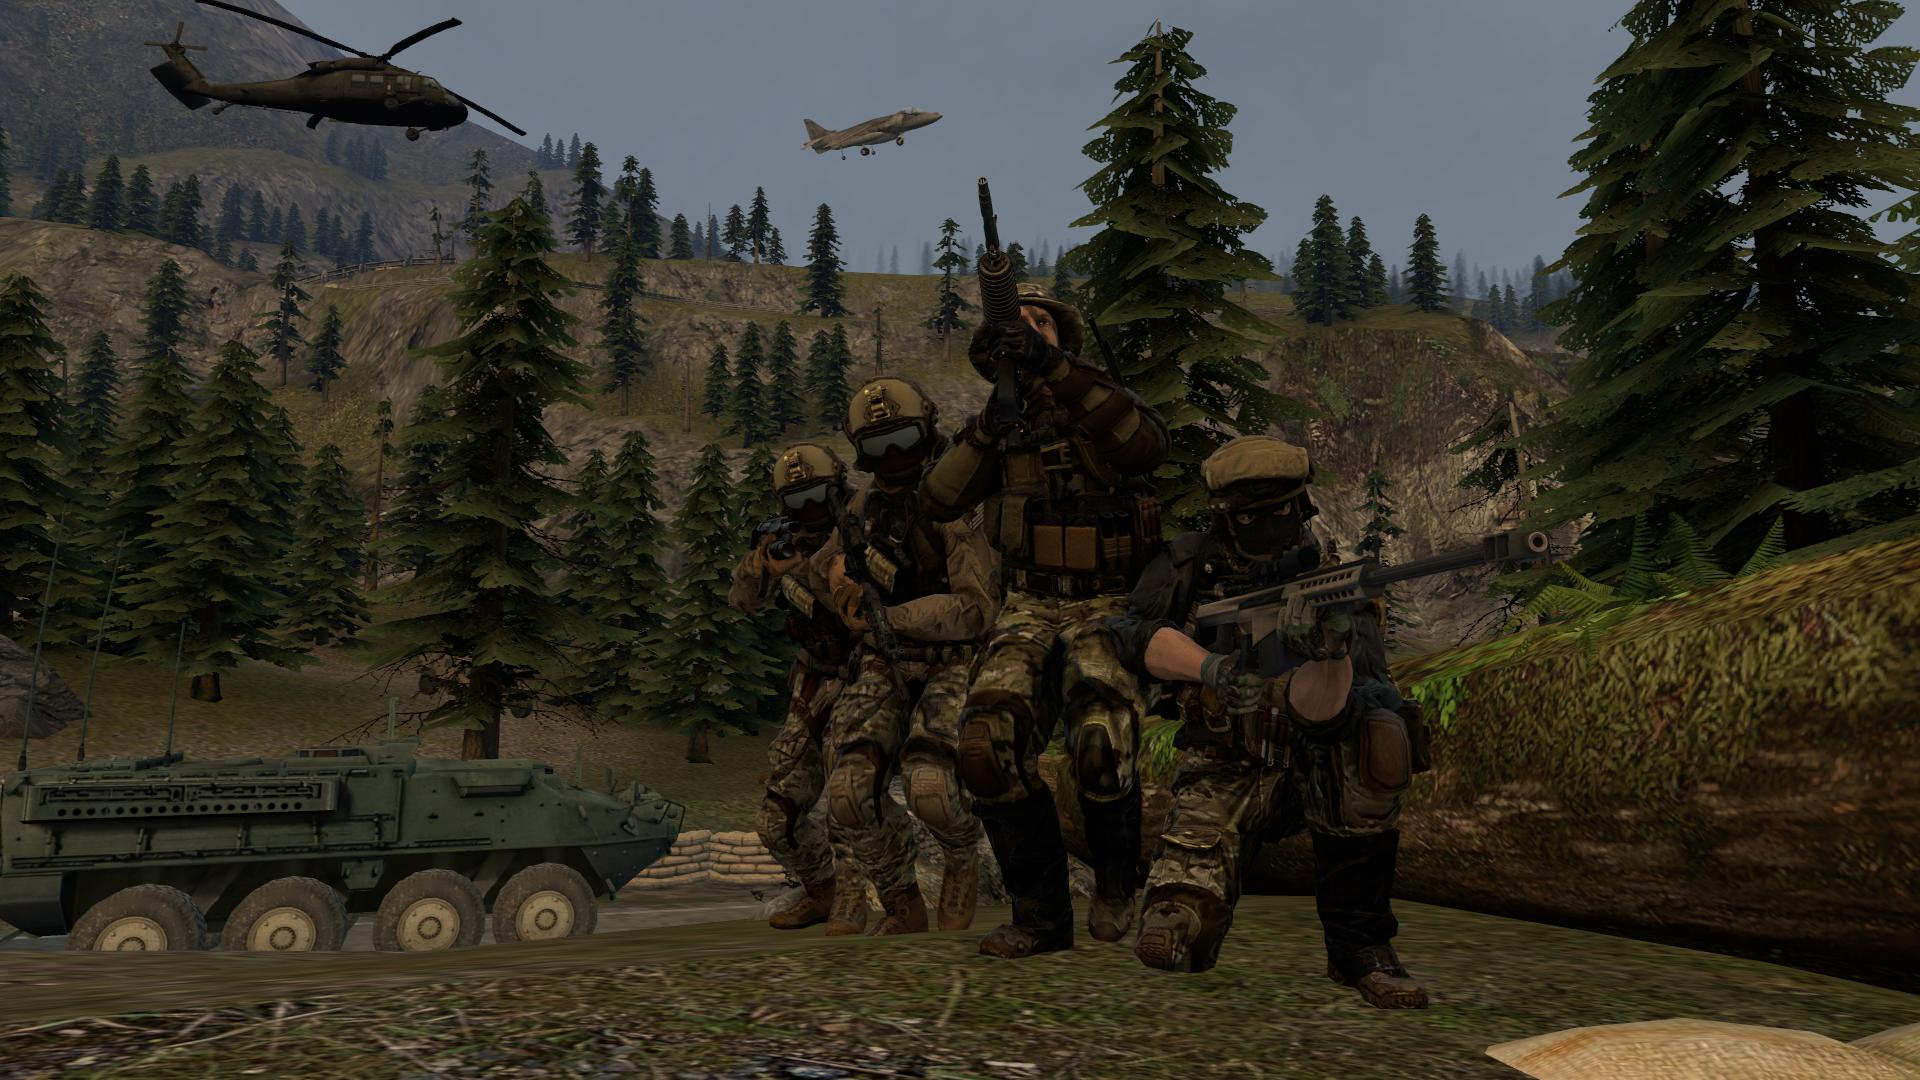 Steam Workshop :: Military Rp server addons